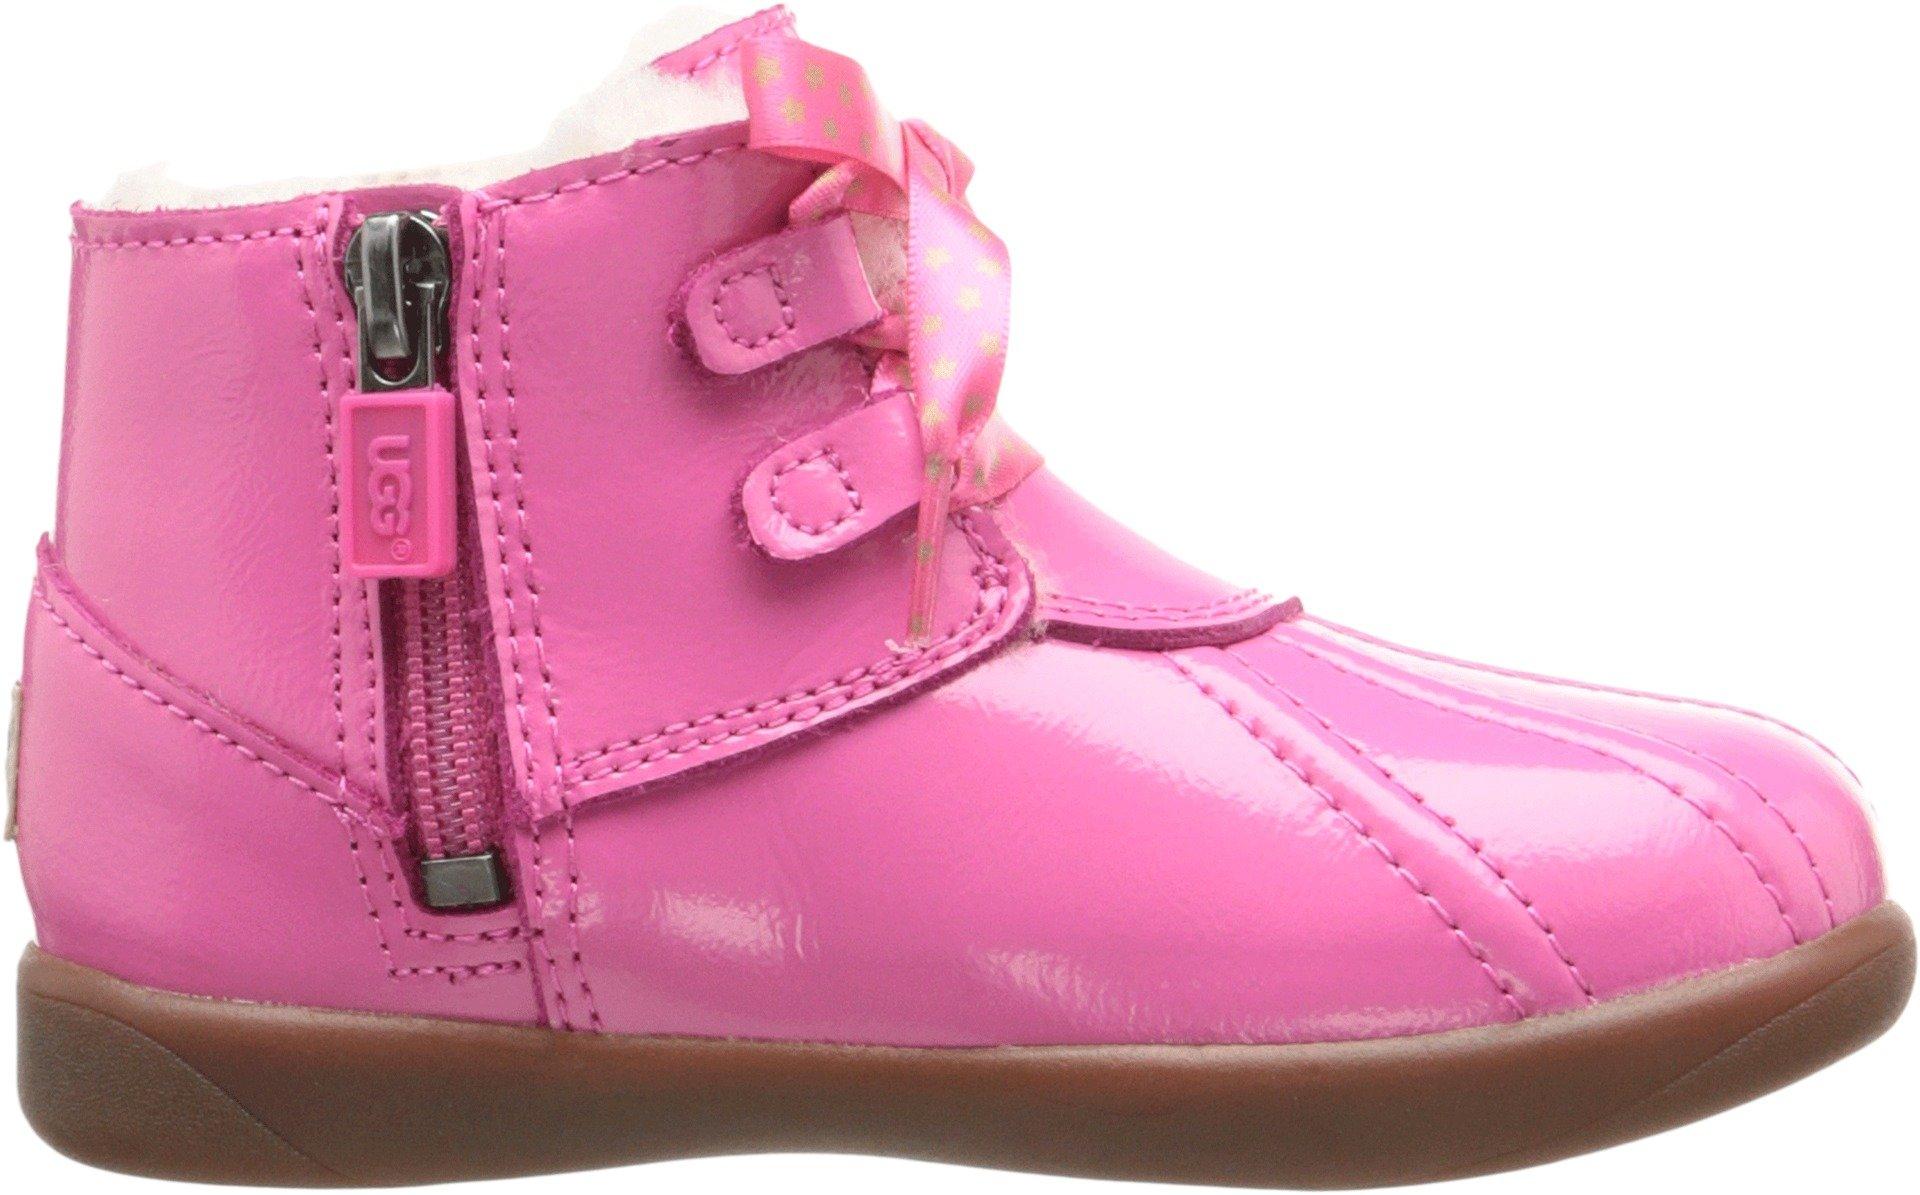 UGG Kids Baby Girl's Payten Stars (Toddler) Diva Pink Boot 9.5 Toddler M